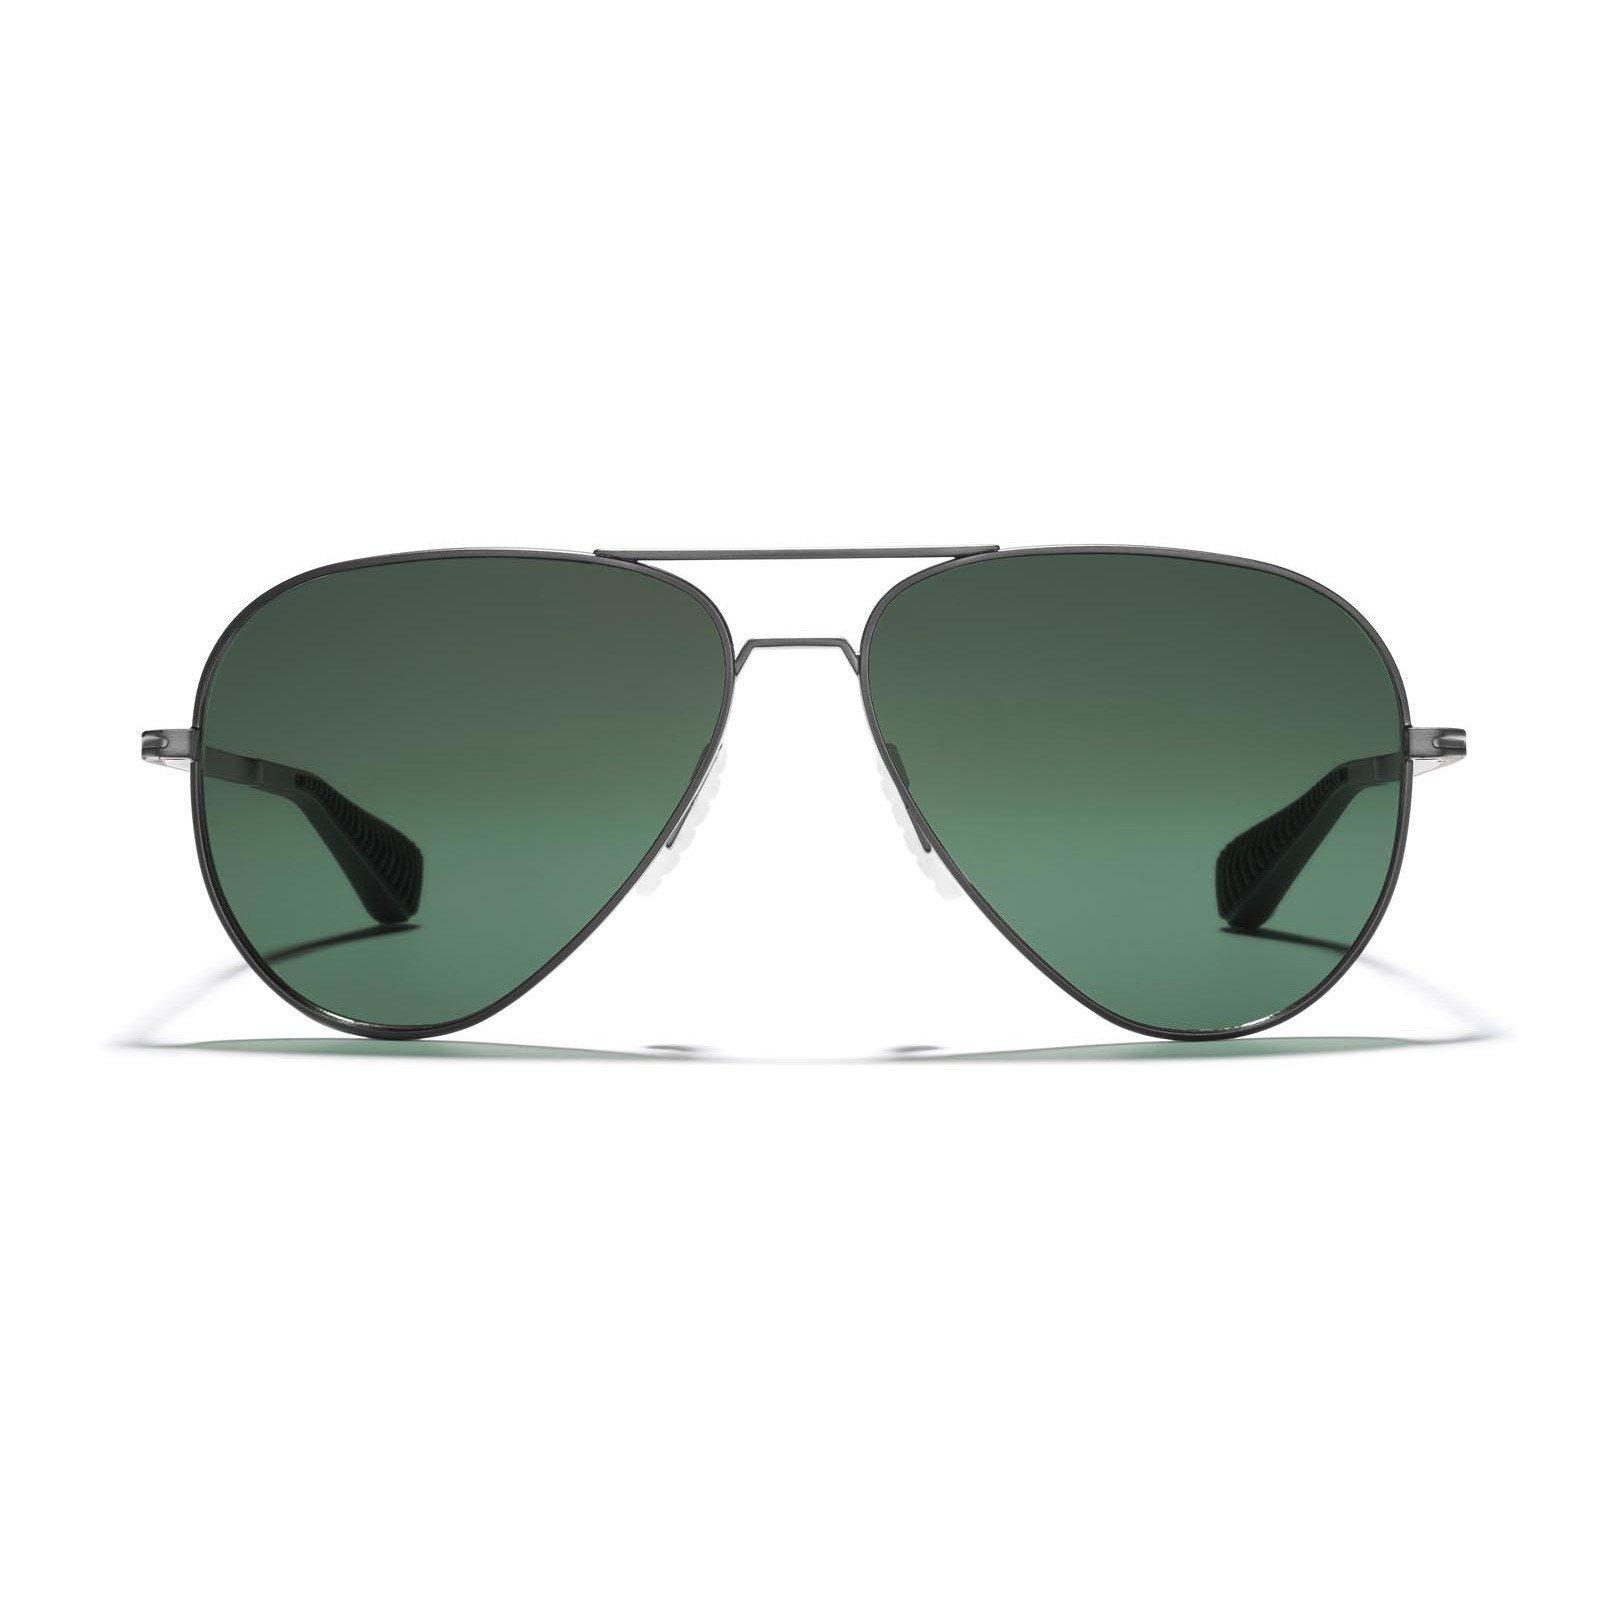 d7c9d0317e Aviator Sunglasses - Sports Sunglasses - Polarized Sunglasses